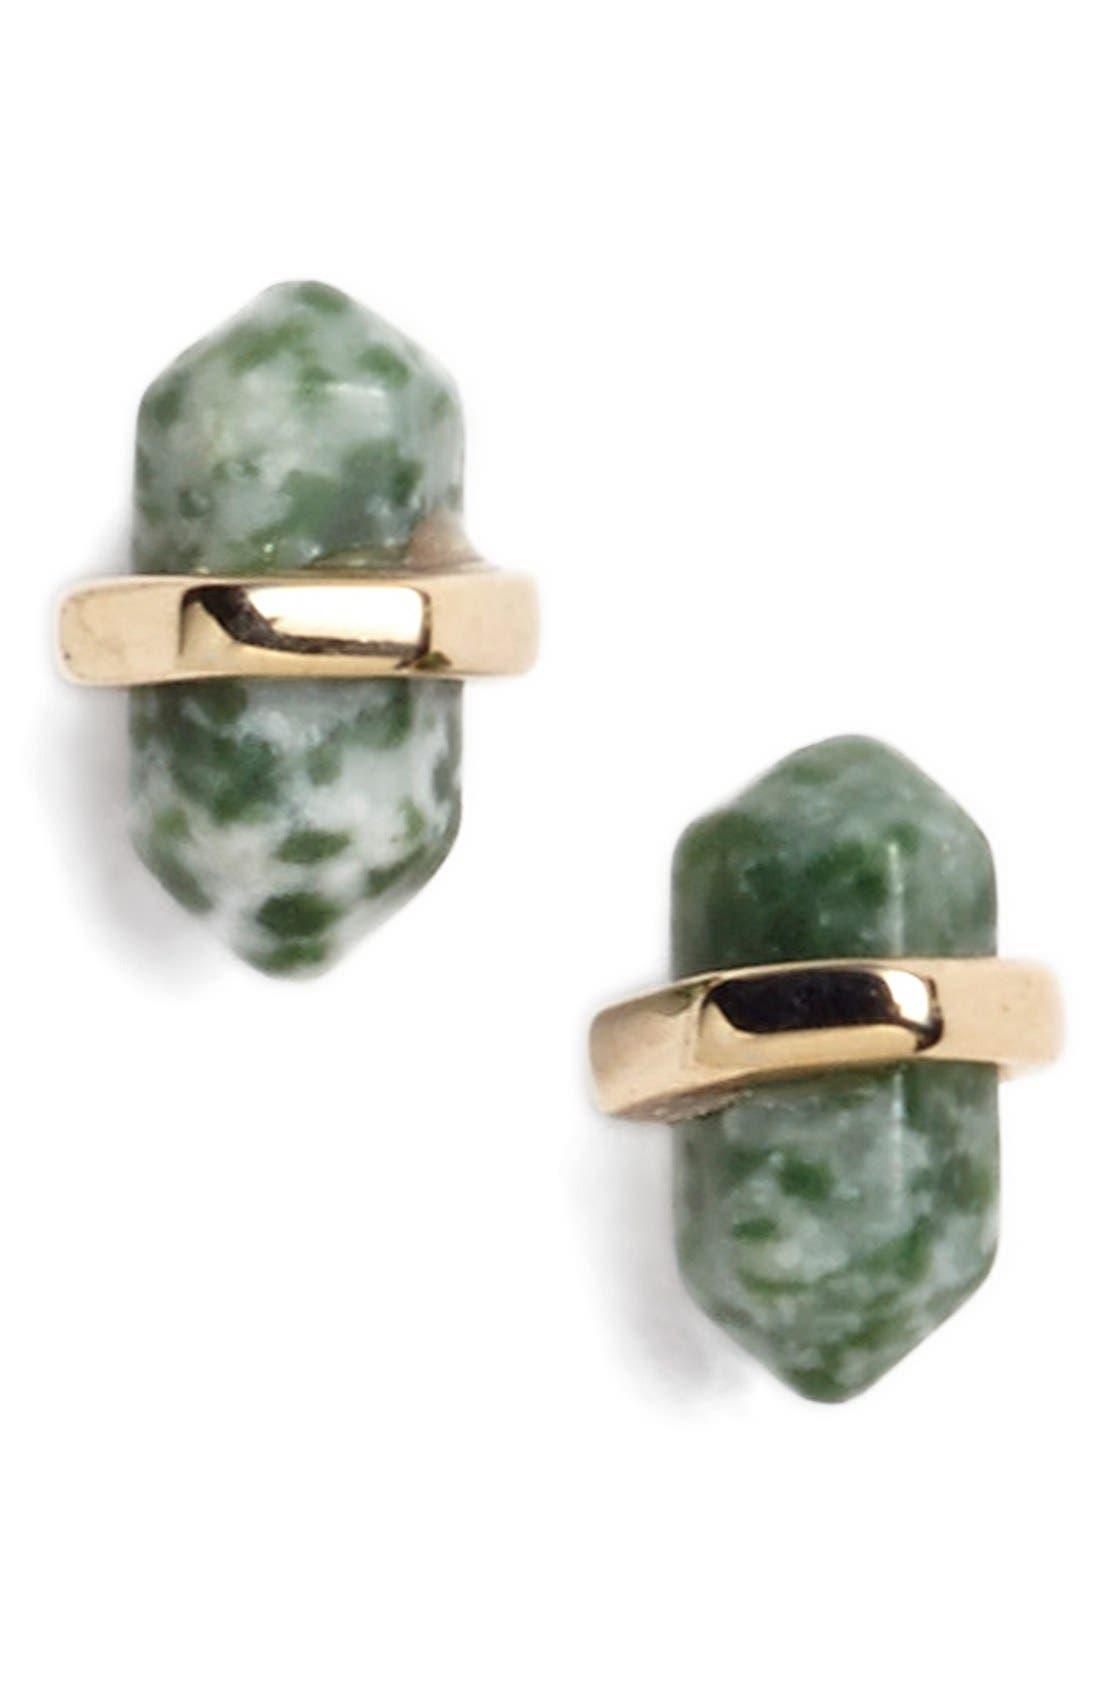 Semiprecious Stone Stud Earrings,                         Main,                         color, Shiny Gold/ Jade